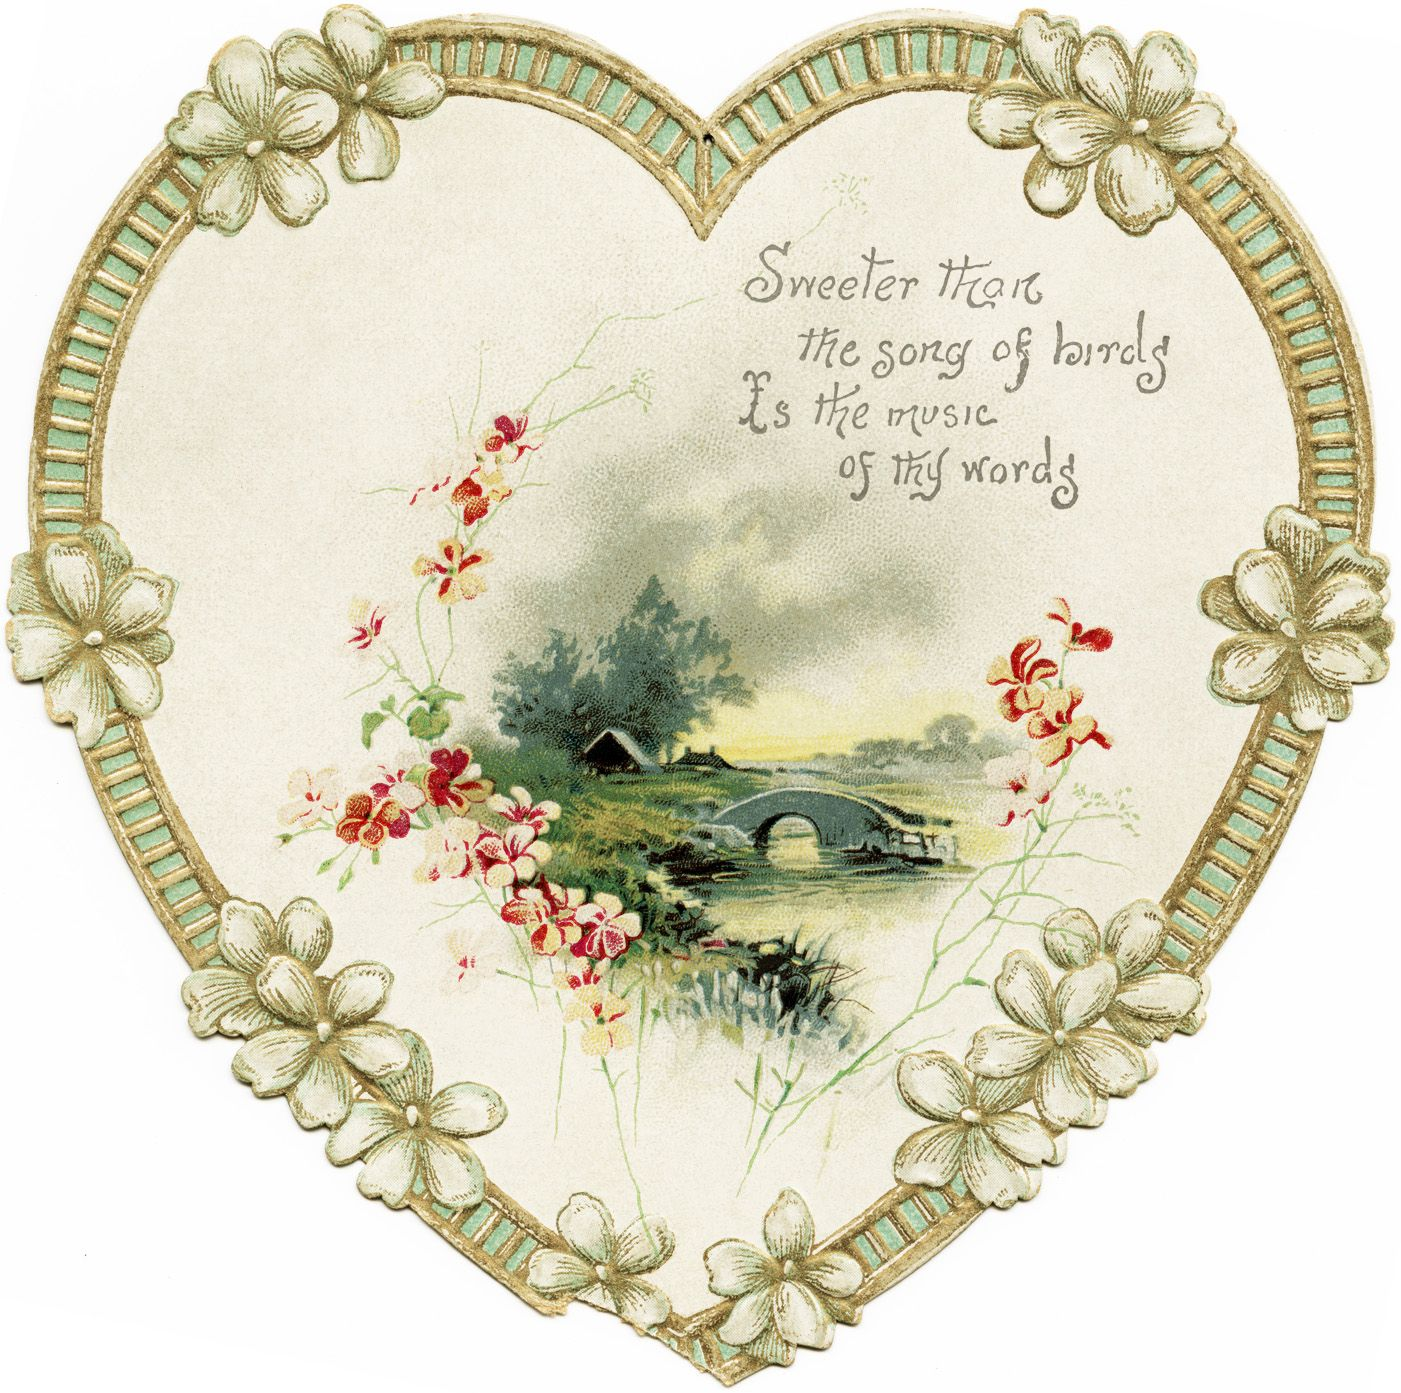 Old Design Shop ~ free digital image: heart shaped Victorian card